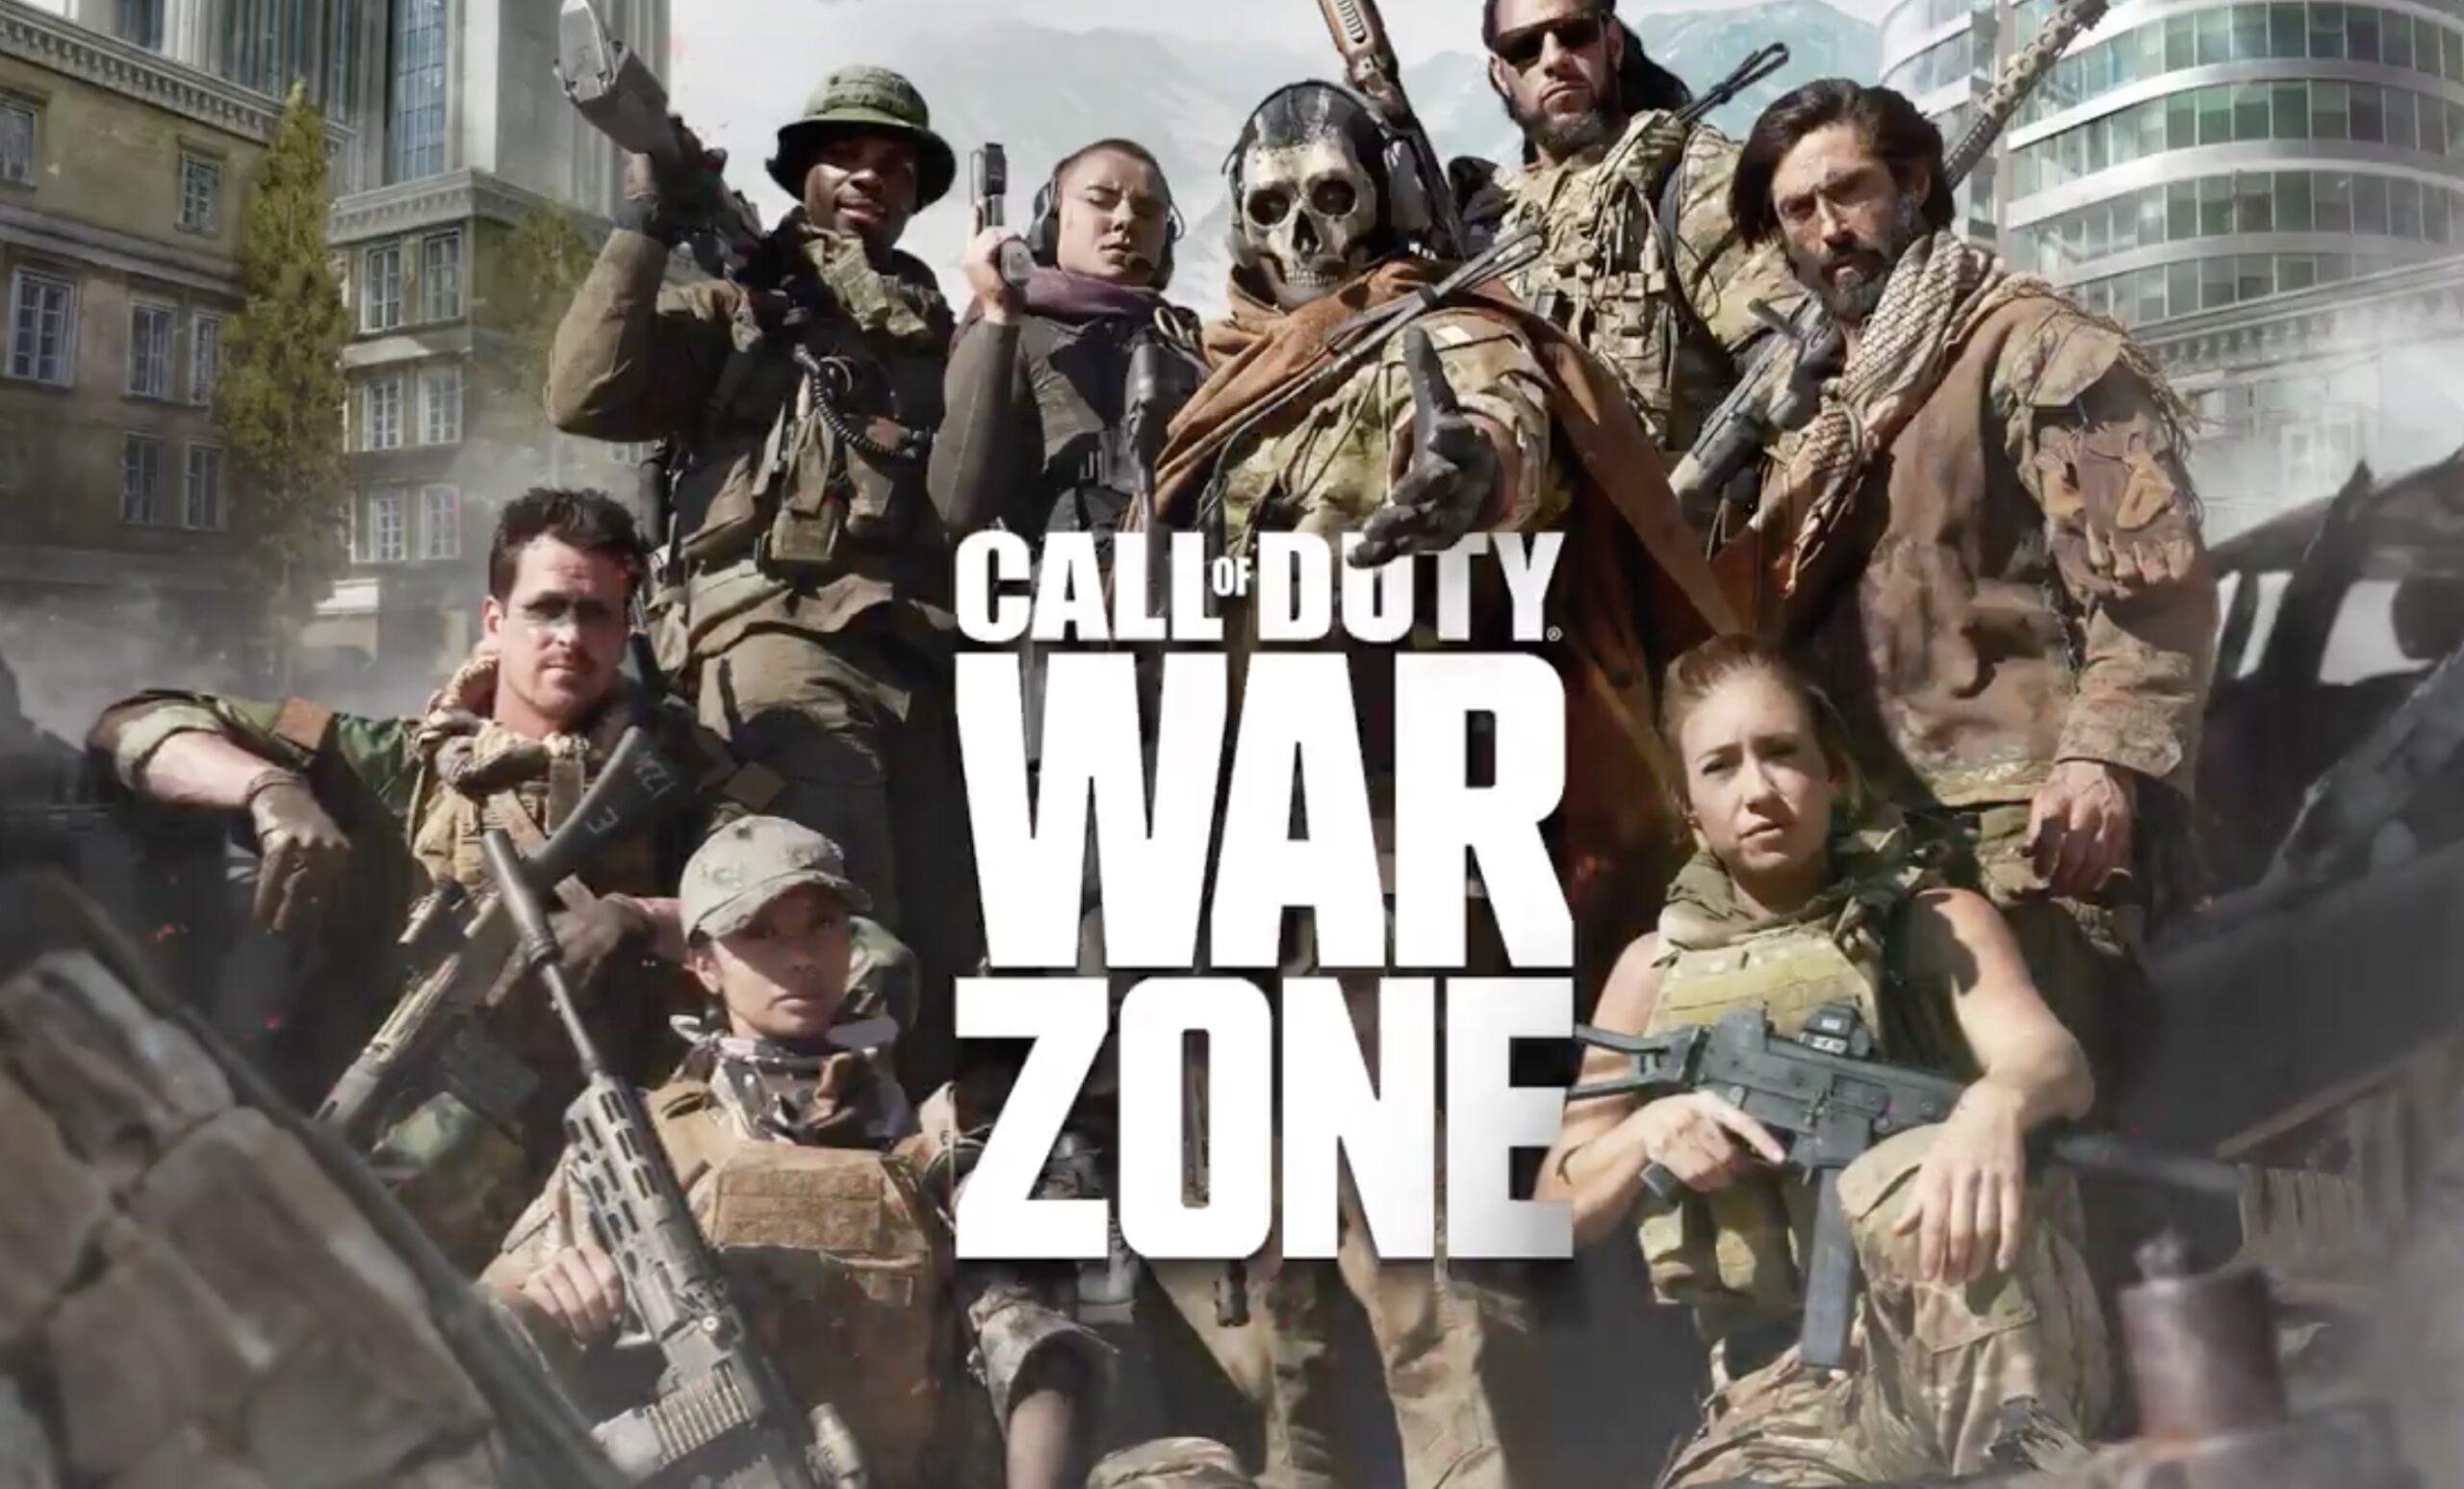 Warzone: Anteprima Stagione 4 - Intervista A Moonryde 19 - Hynerd.it